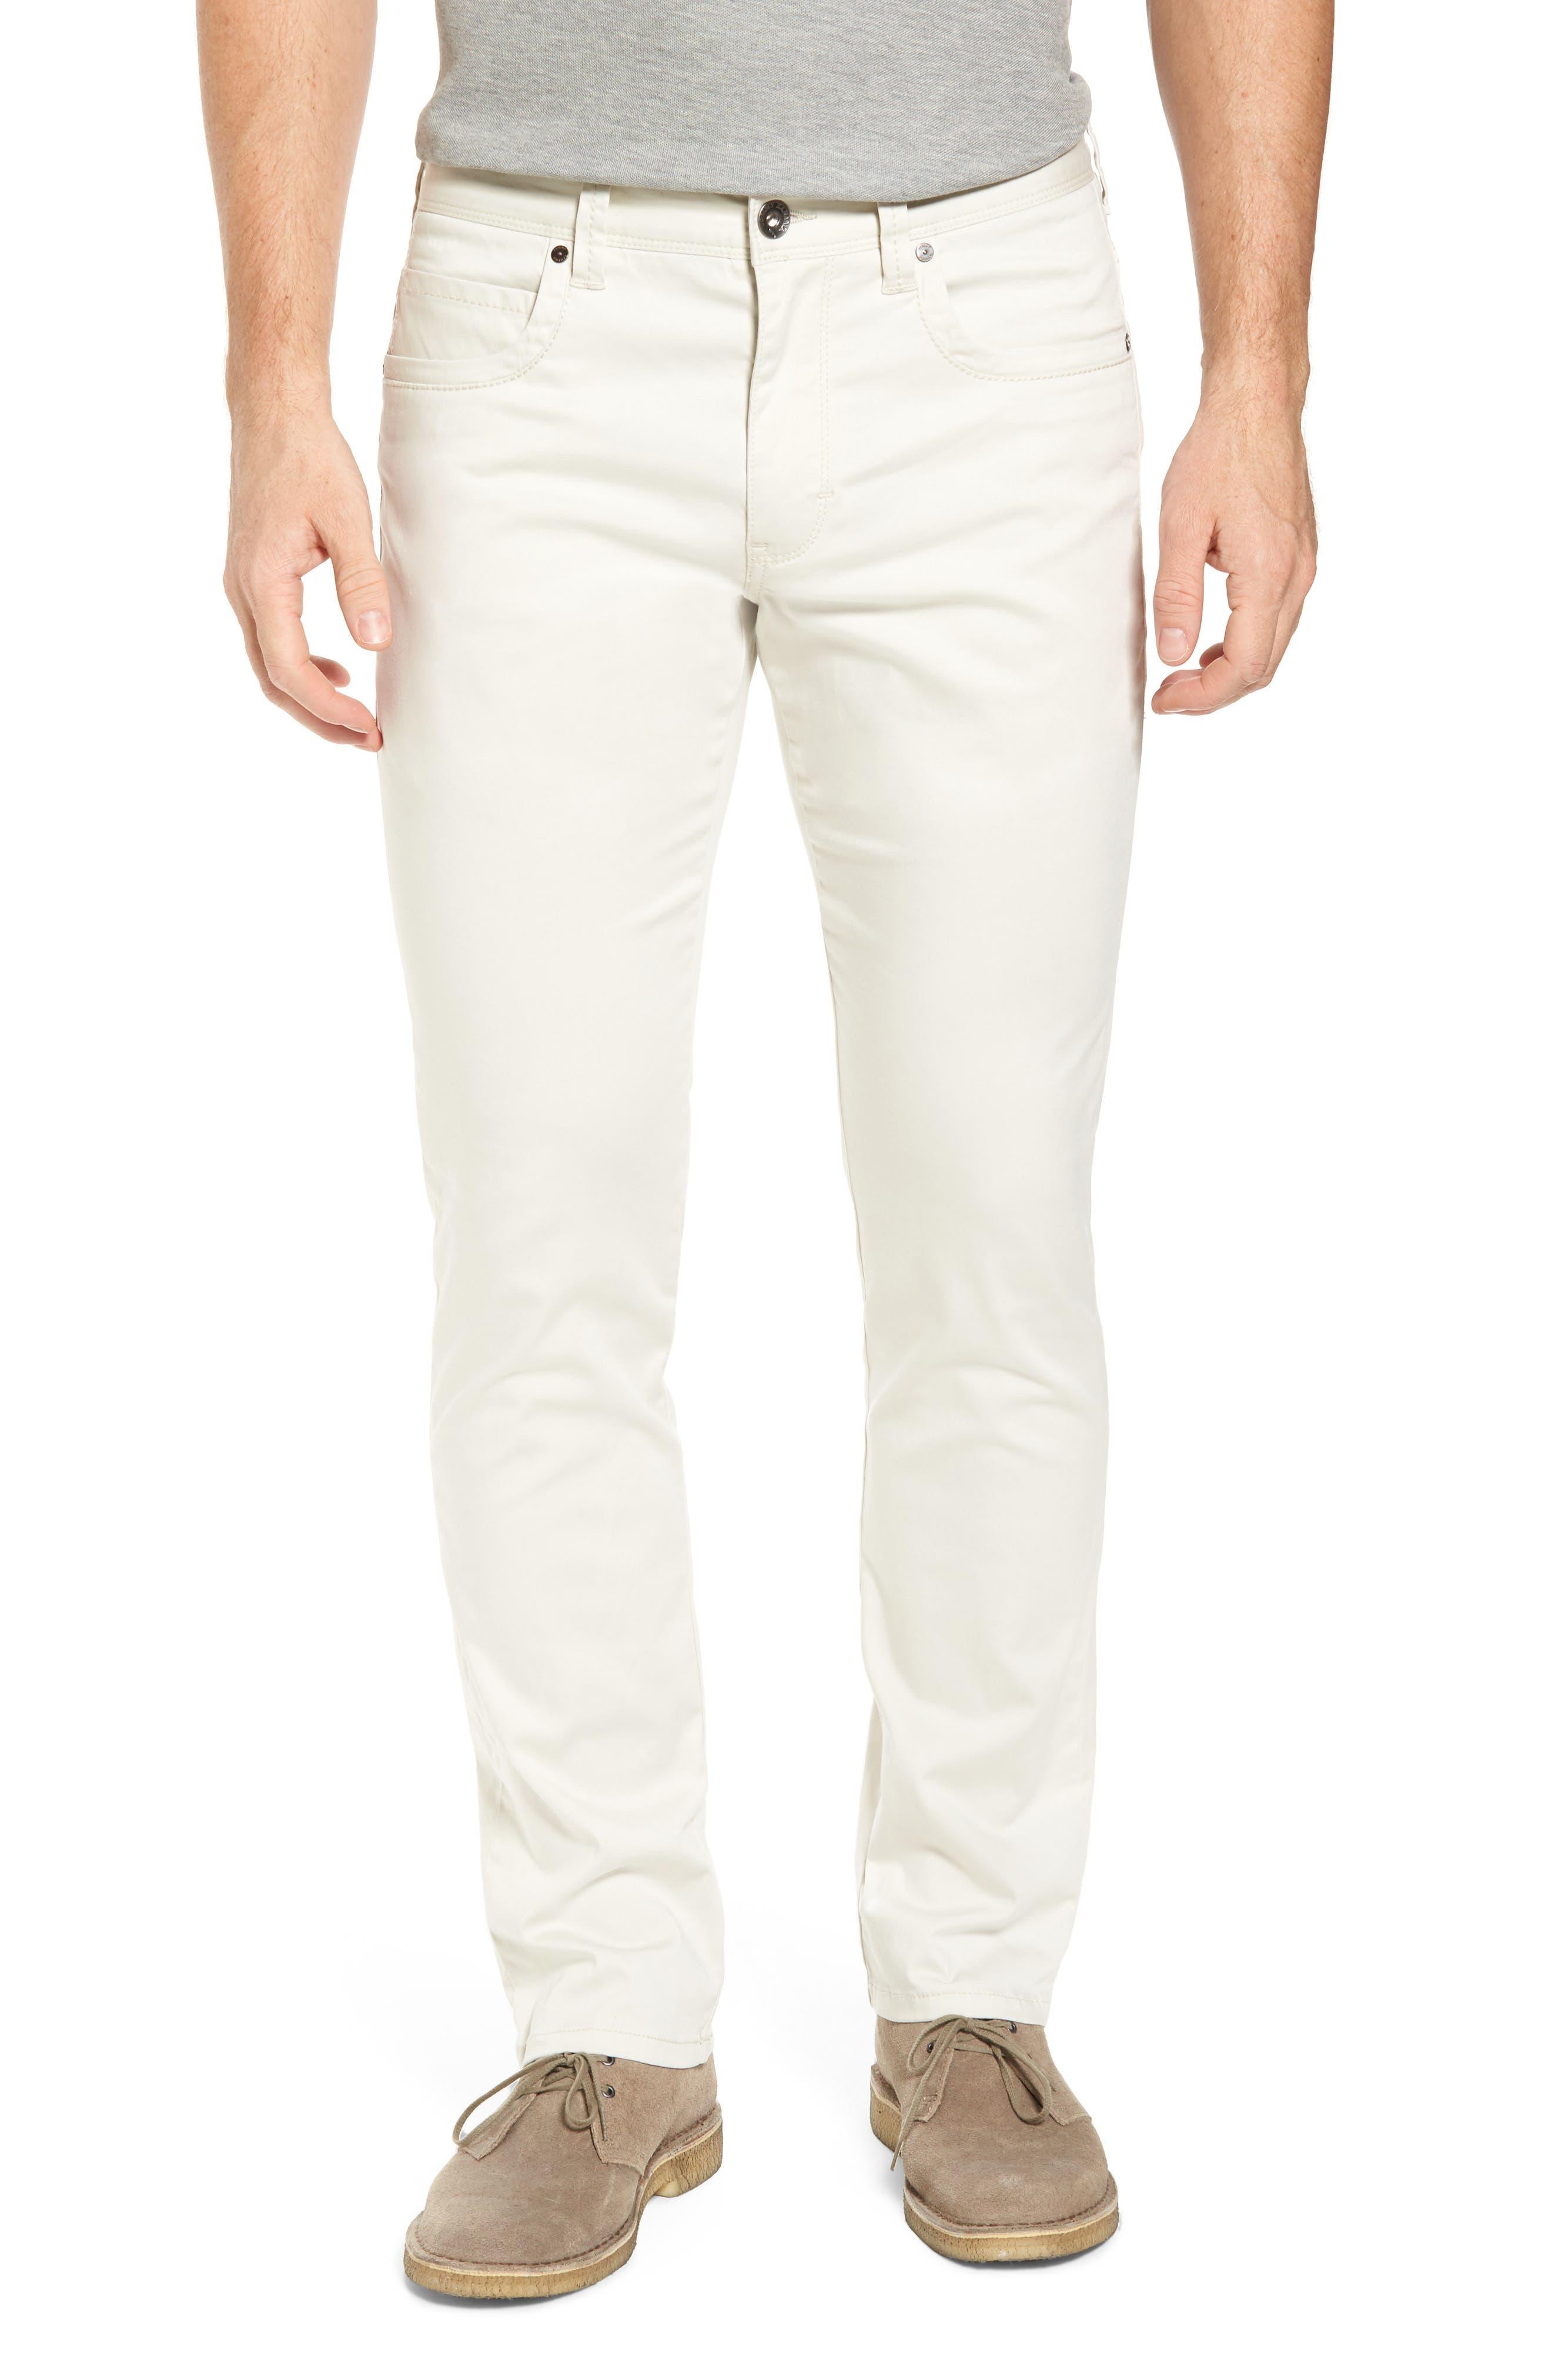 Boracay Pants,                         Main,                         color, Bleached Sand